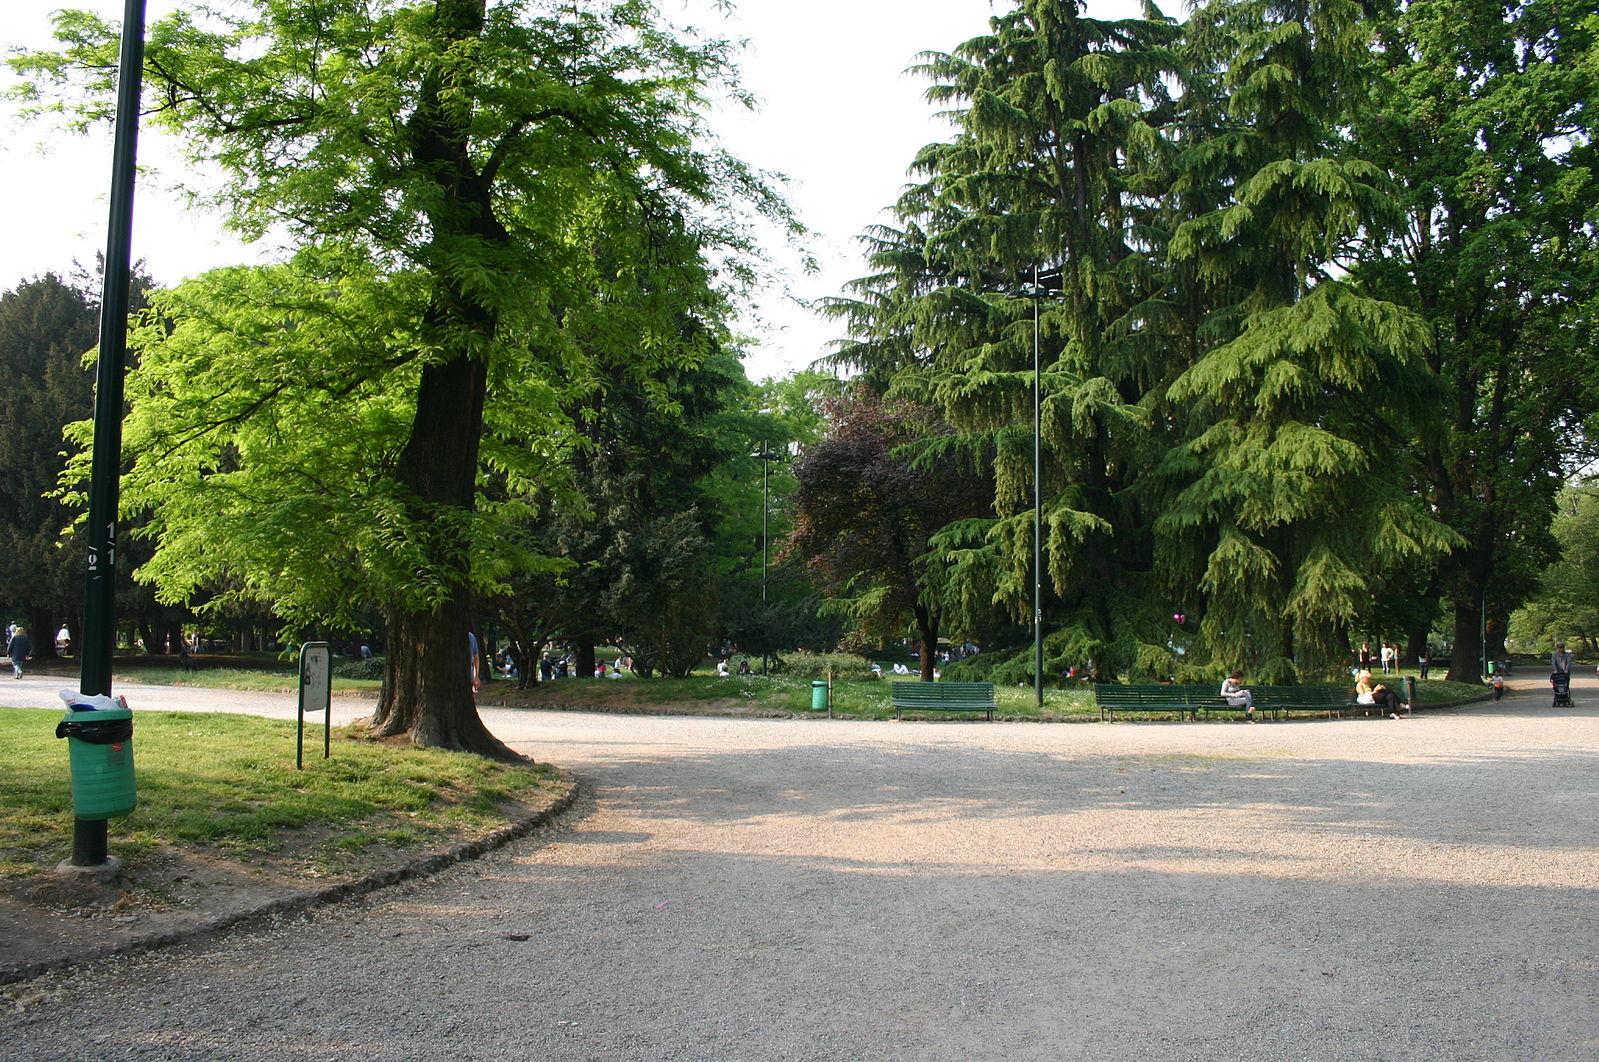 Giardini public gardens